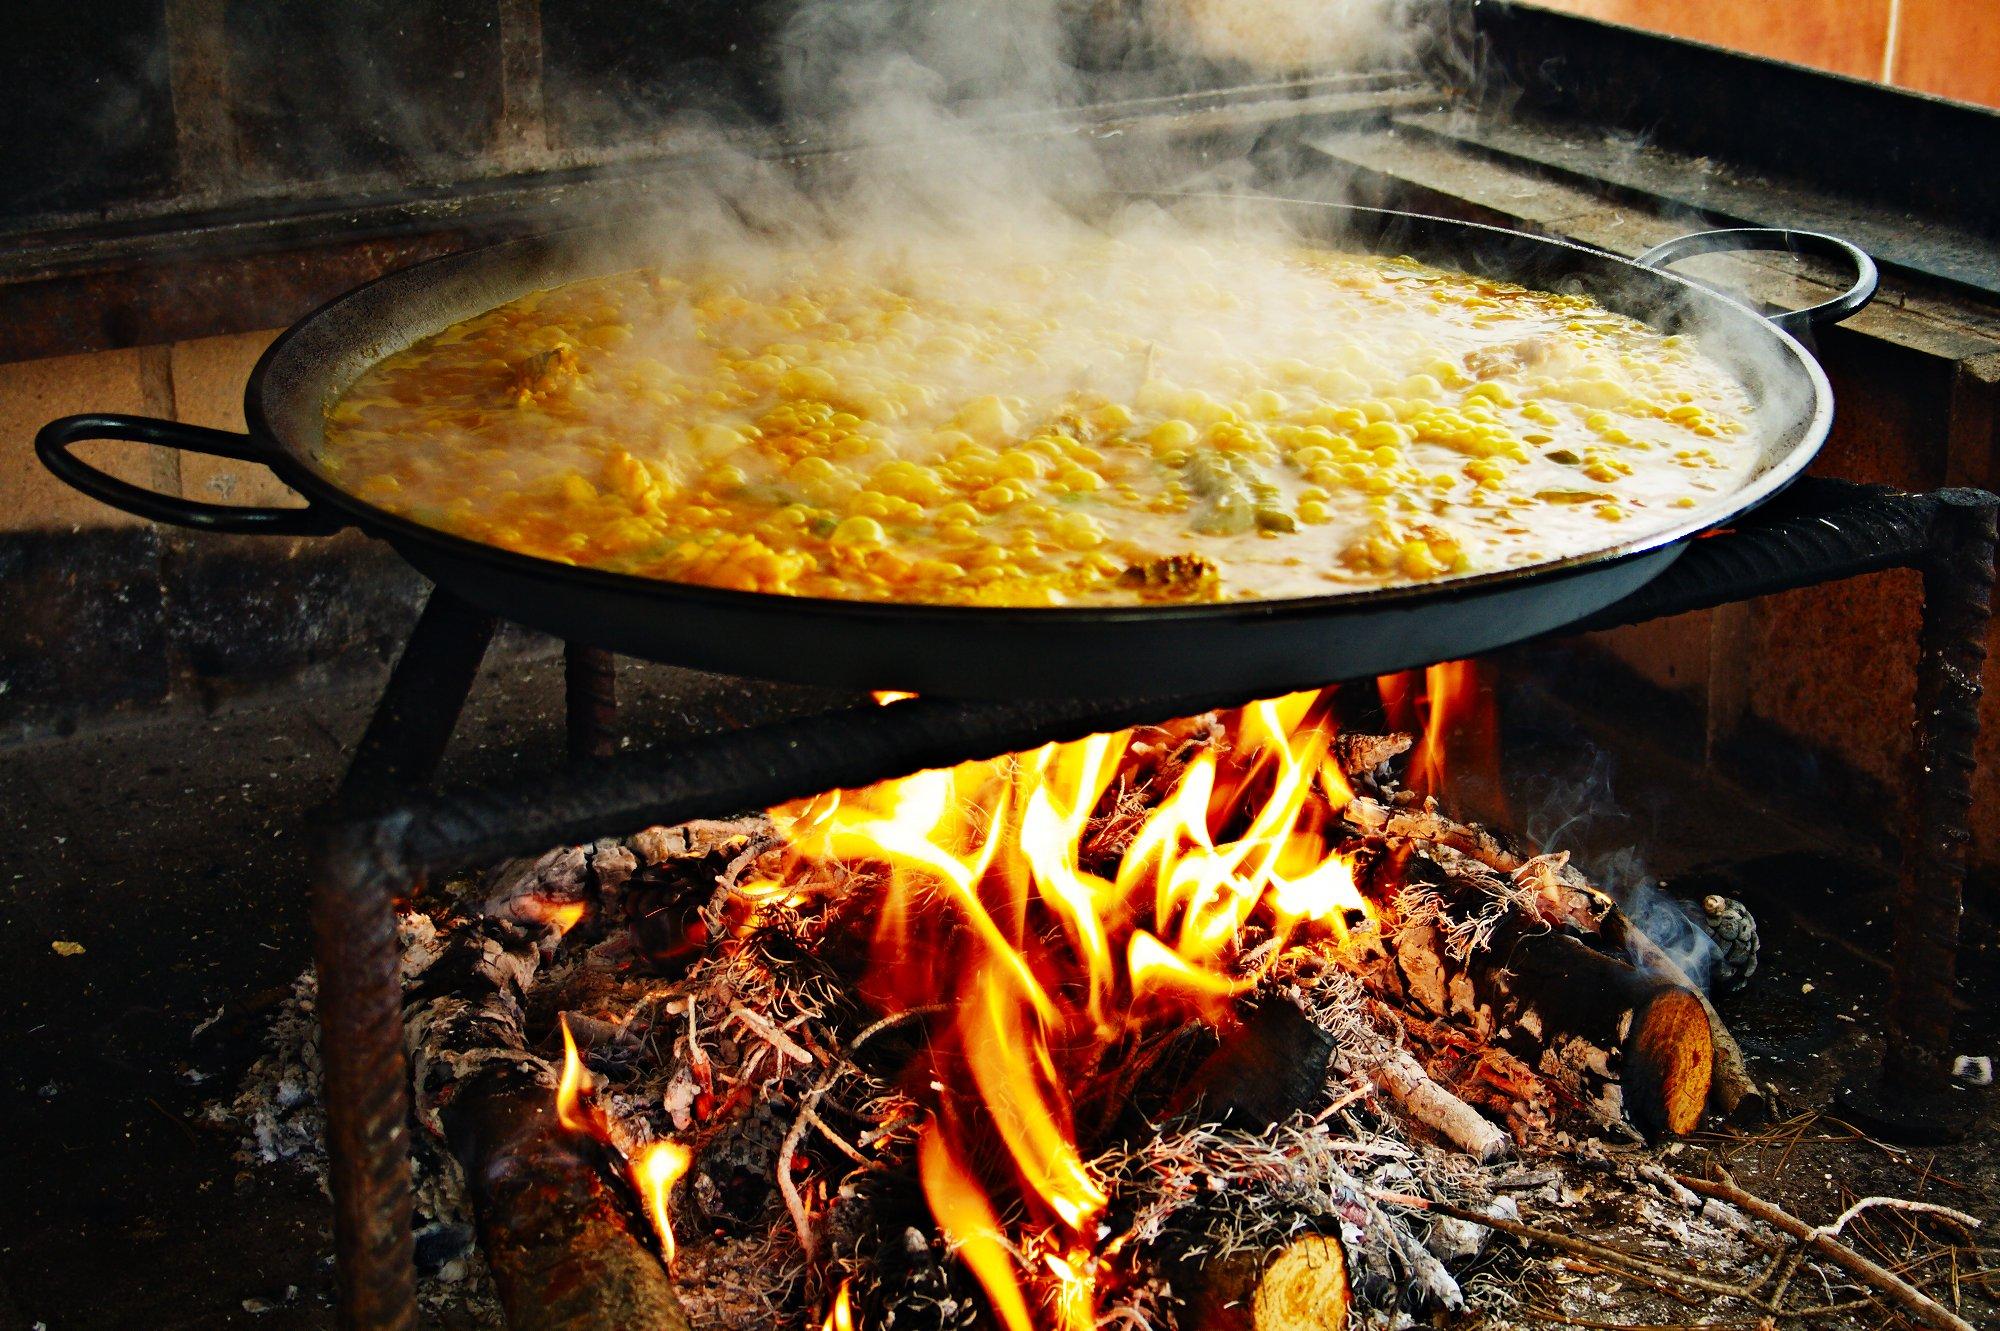 Fabricant Poele A Bois Espagne paella | wiki guy de rambaud | fandom